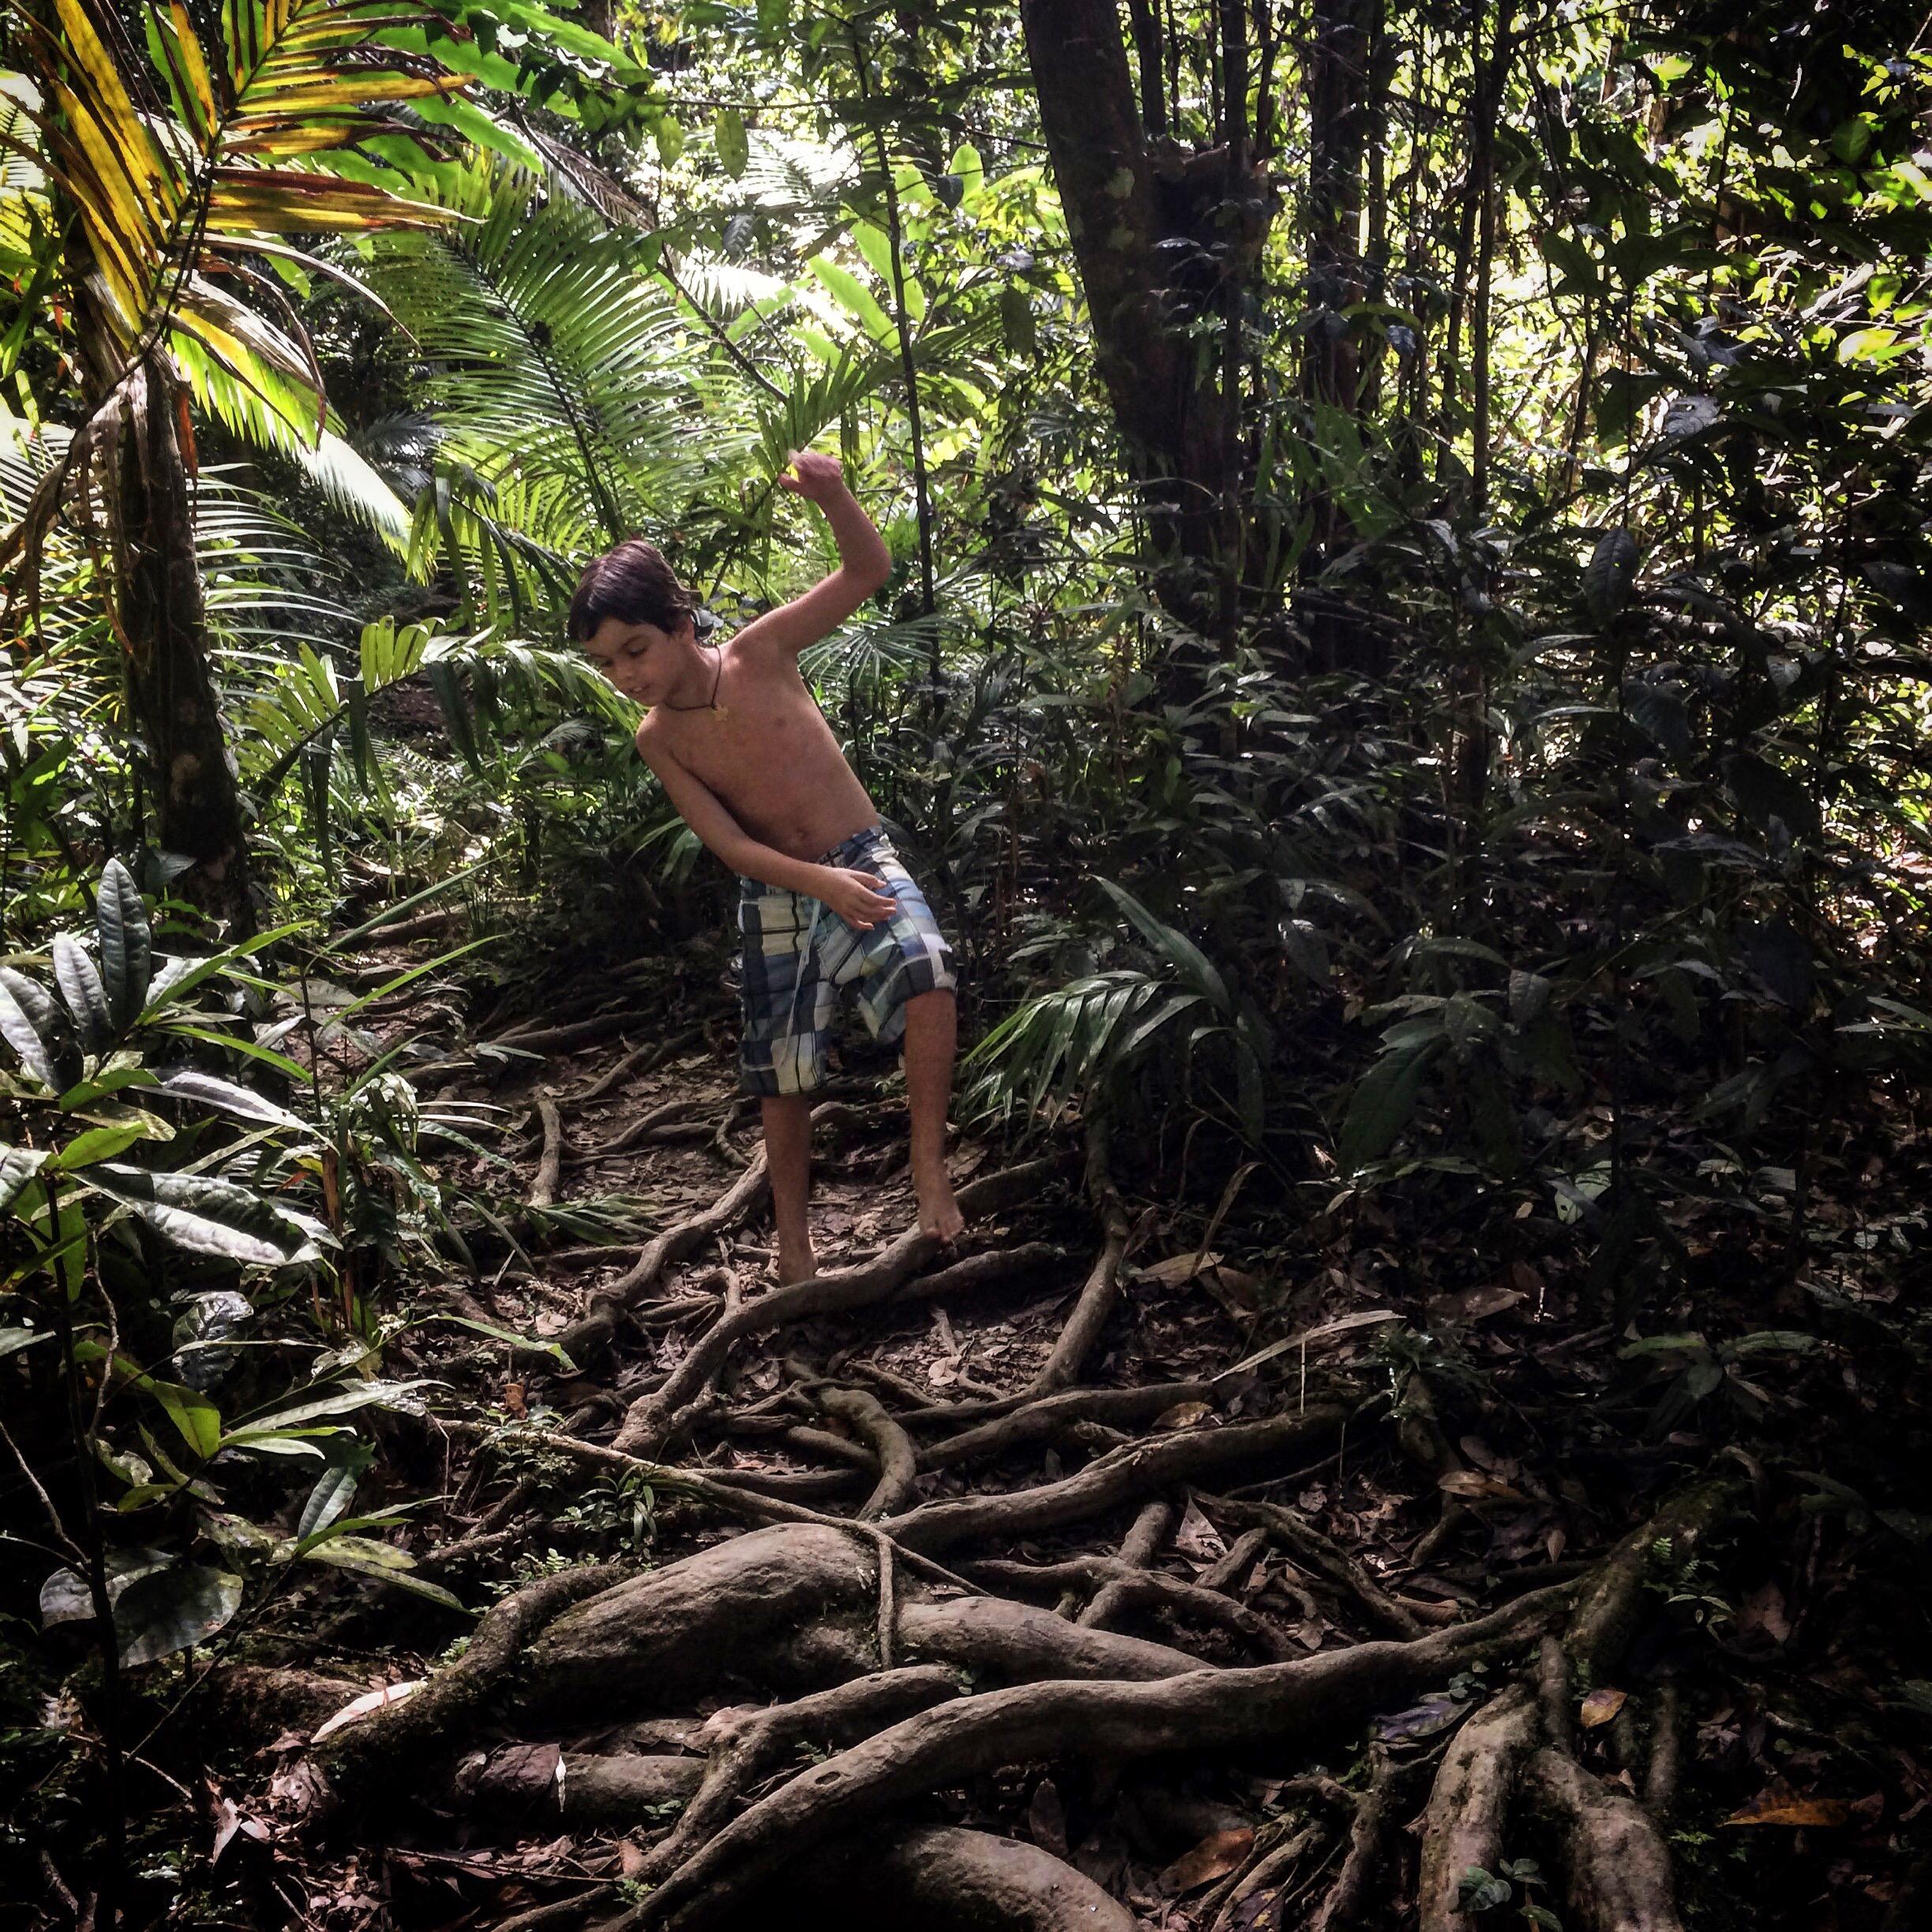 Explore the Daintree Rainforest, just north of Port Douglas